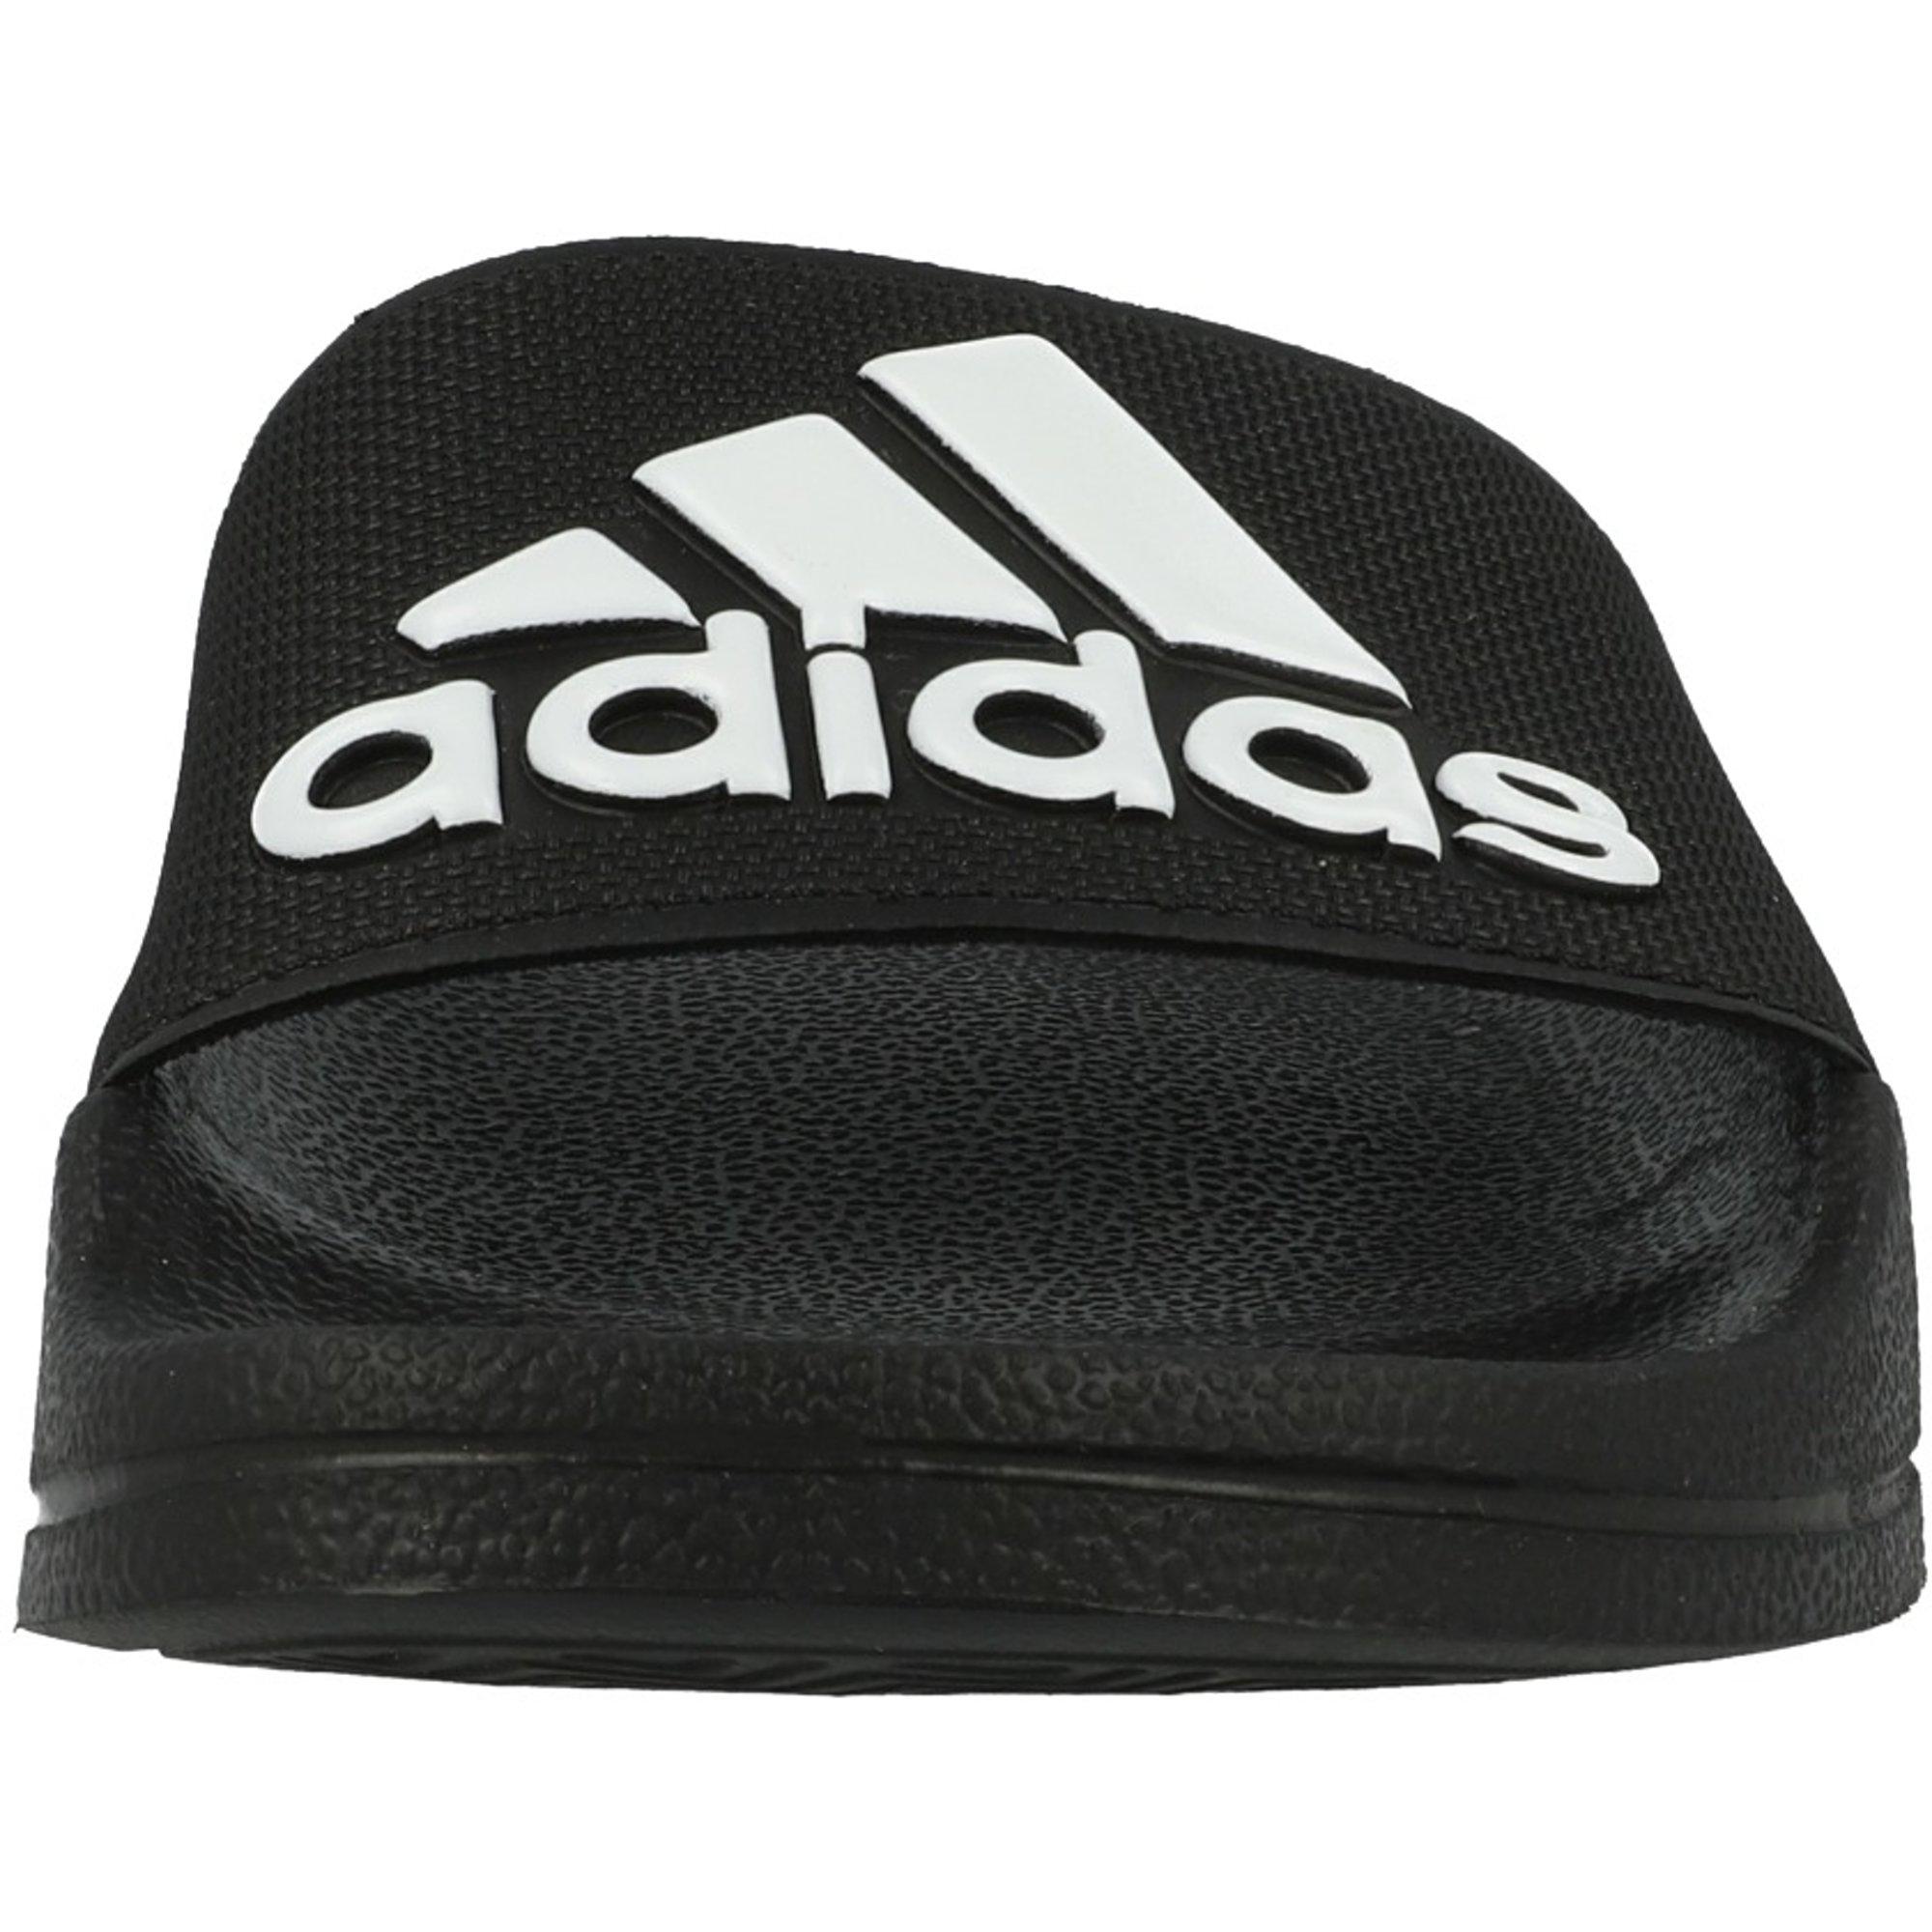 adidas ultra stivali 19 nero and bianca